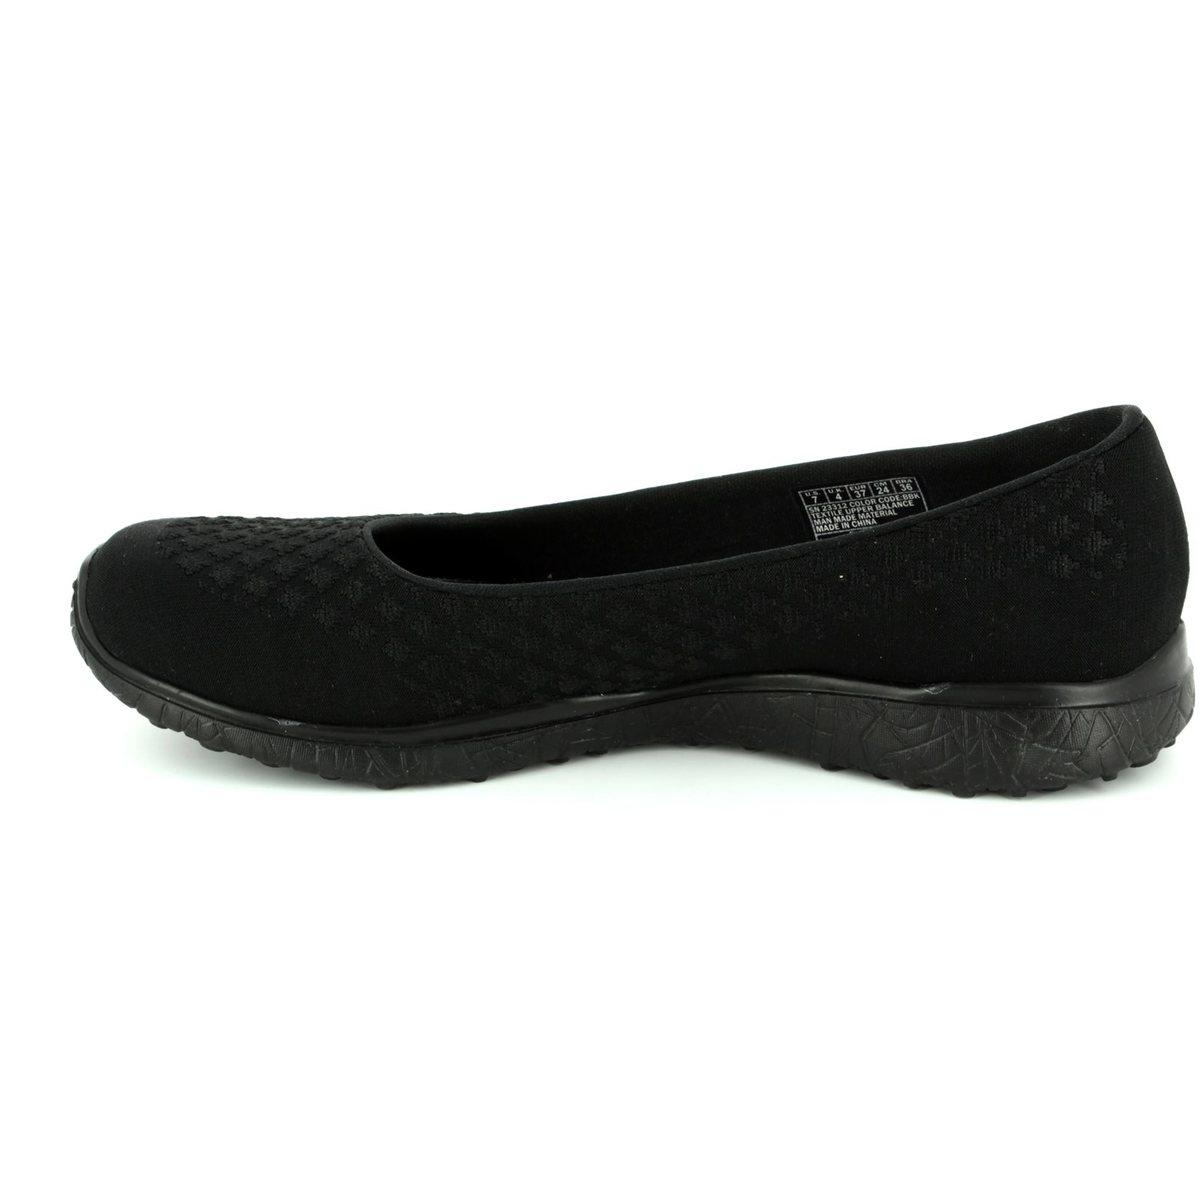 skechers pumps. skechers pumps \u0026 ballerinas - black 23312/007 microburst c